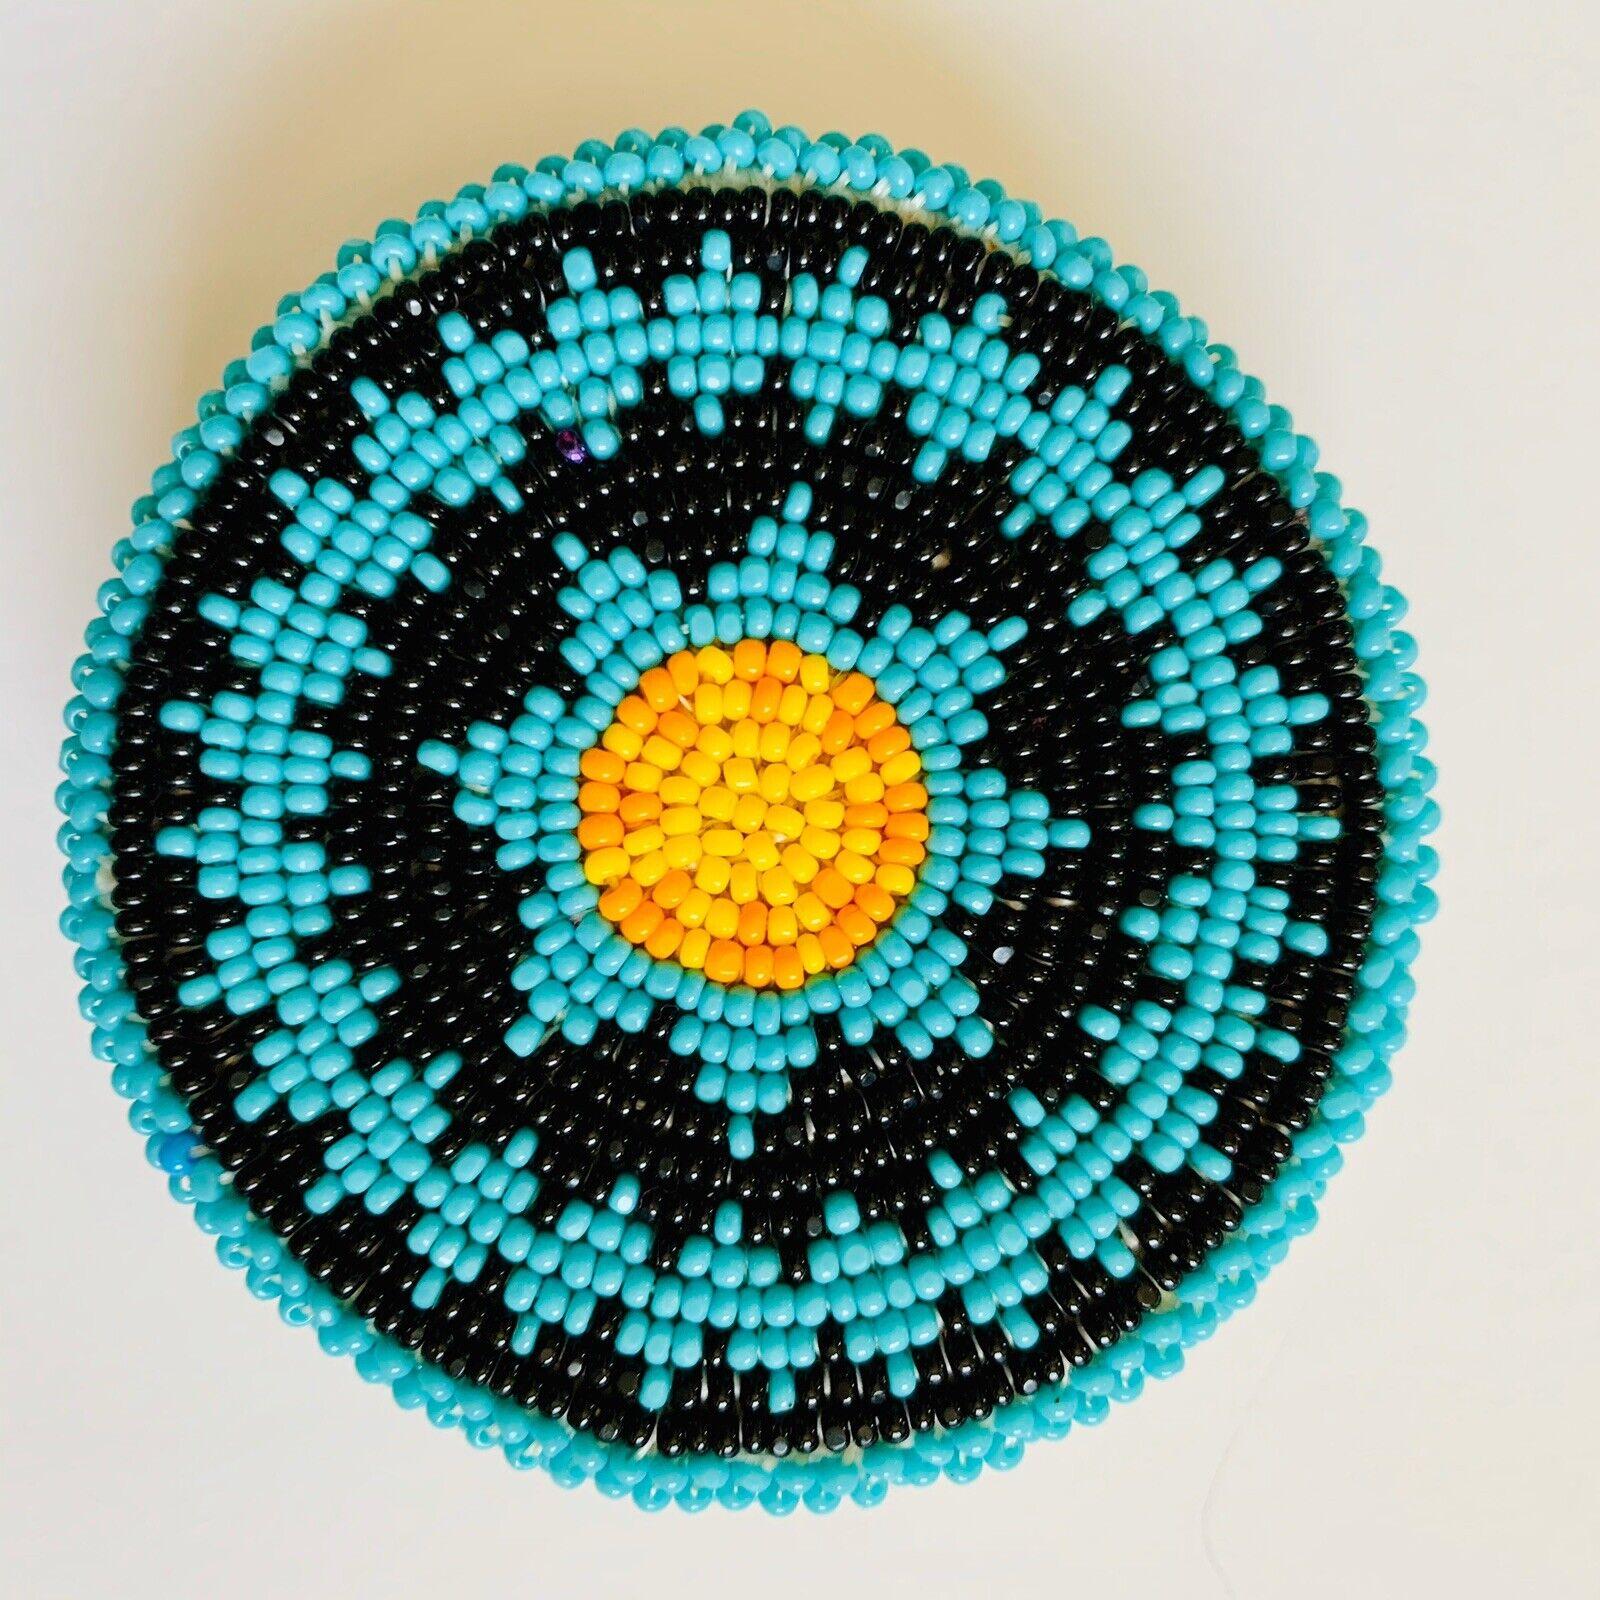 Native American Belt Buckle Shoshone Beaded Blue Black Yellow Orange Leather